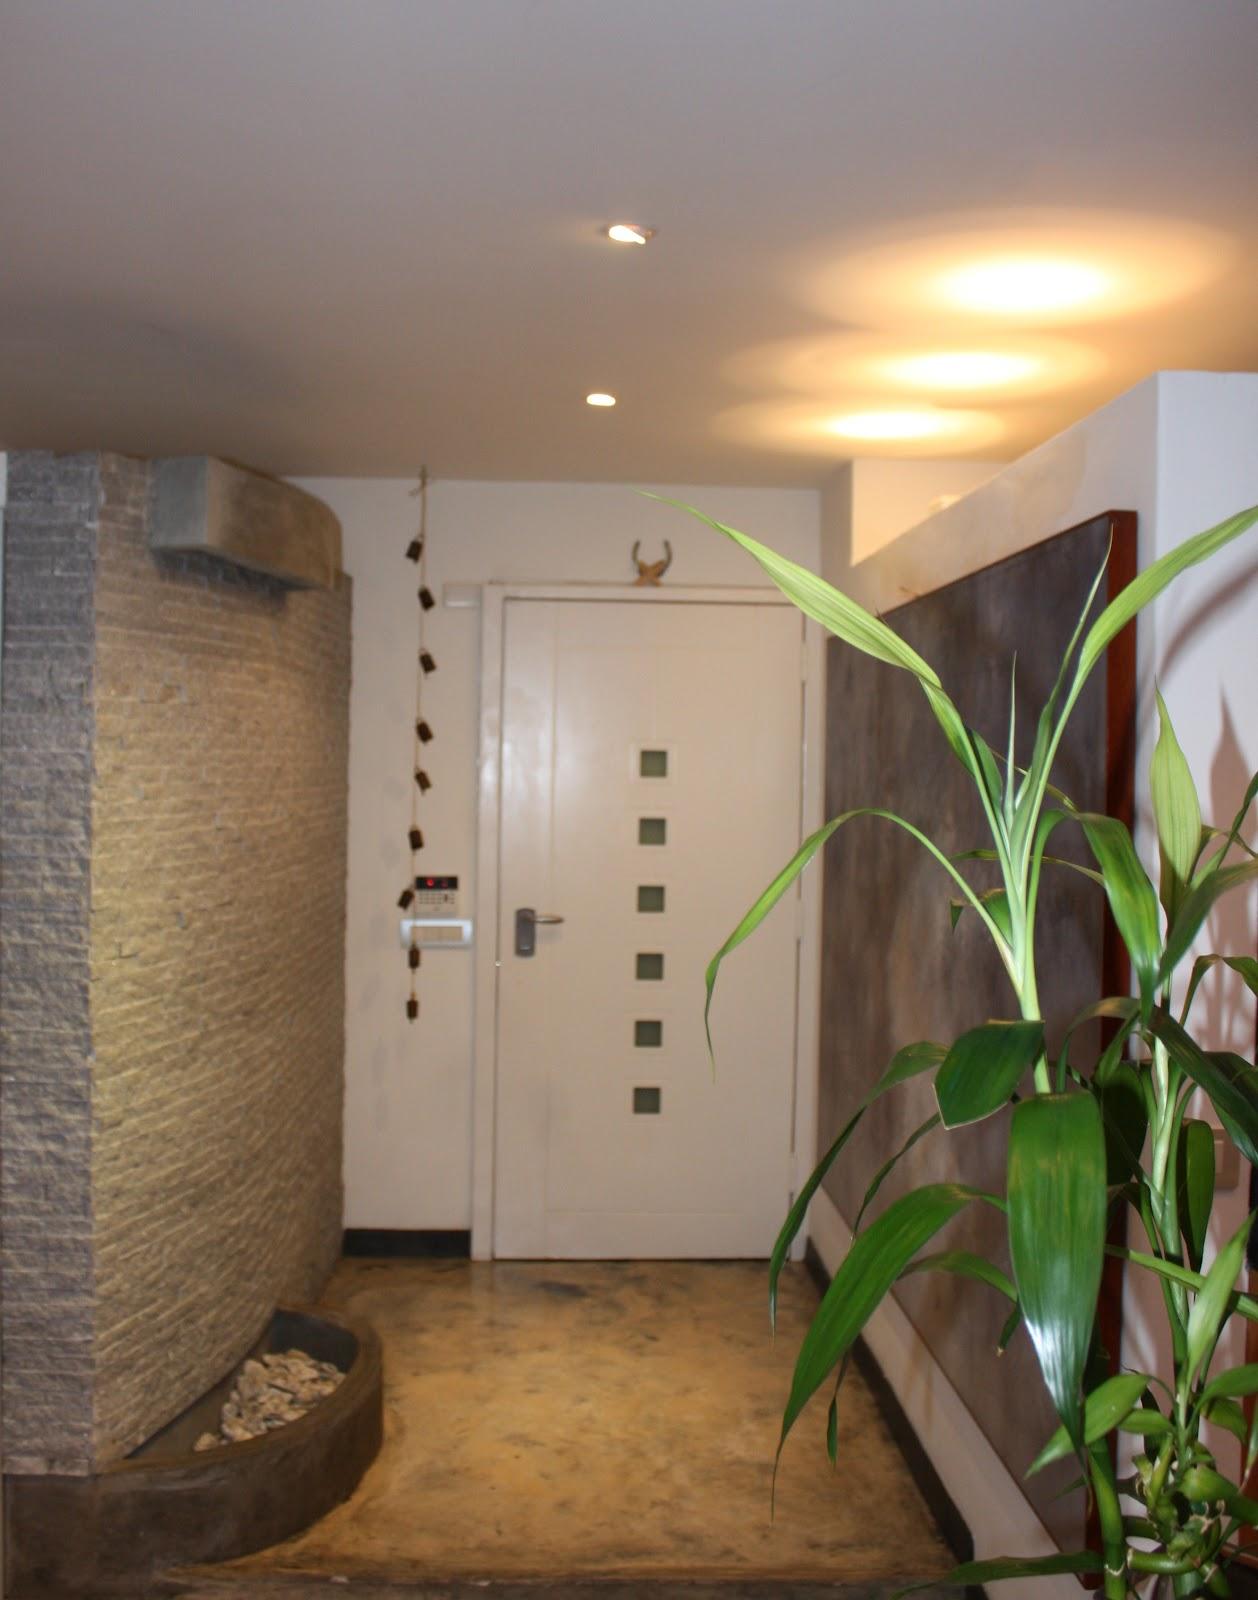 Fabuloso Apartamento Mirador de Oripoto: HALL DE ENTRADA OG63